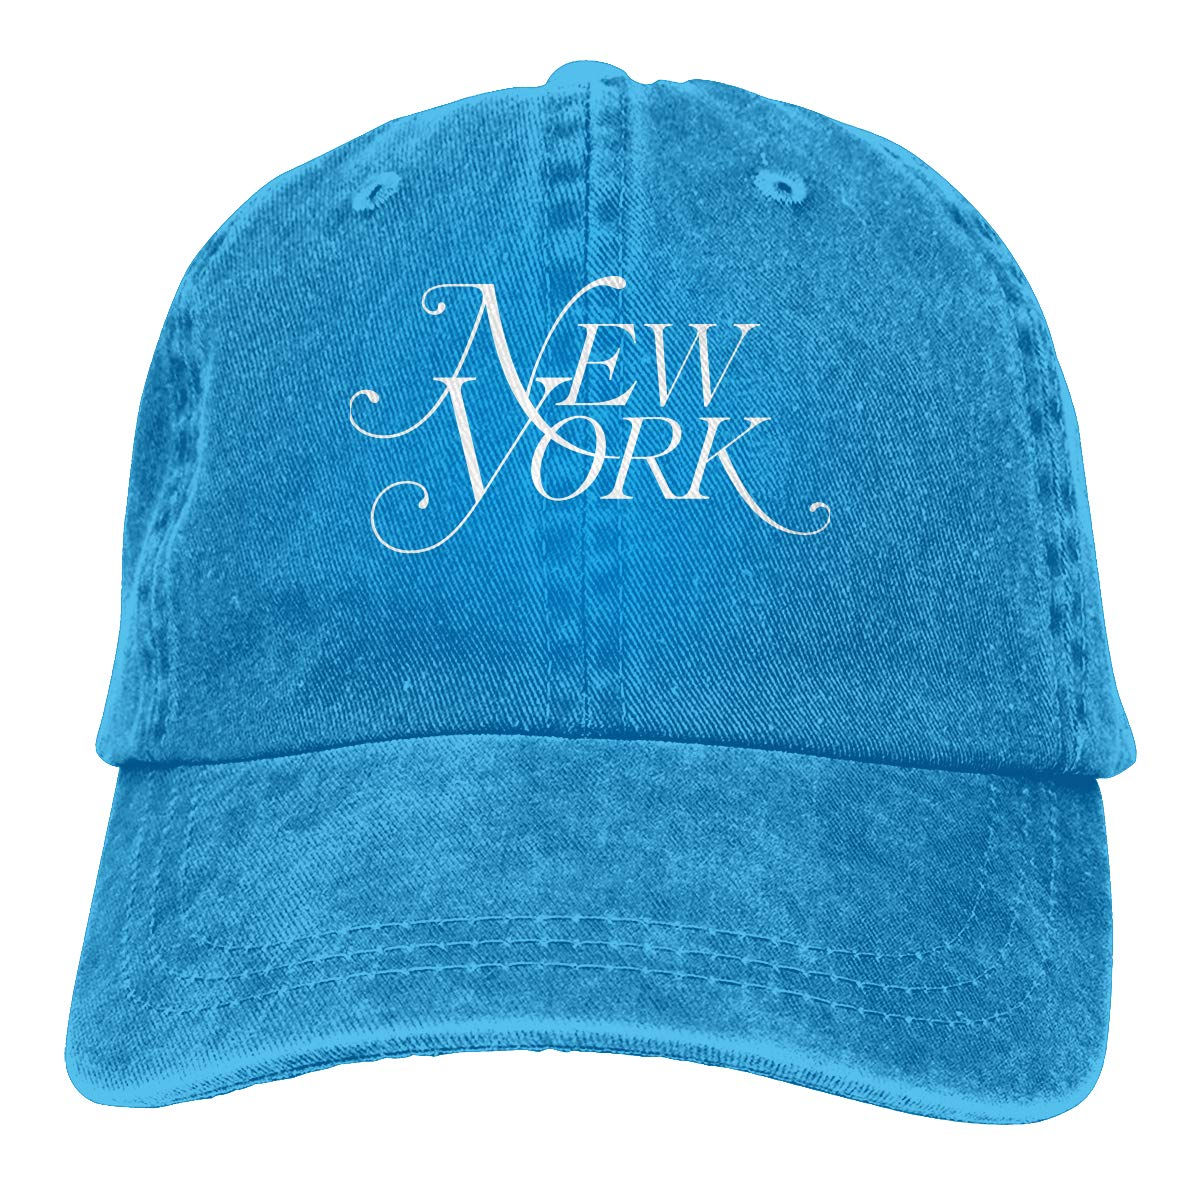 Adult Unisex Cowboy Cap Adjustable Hat New York Cotton Denim